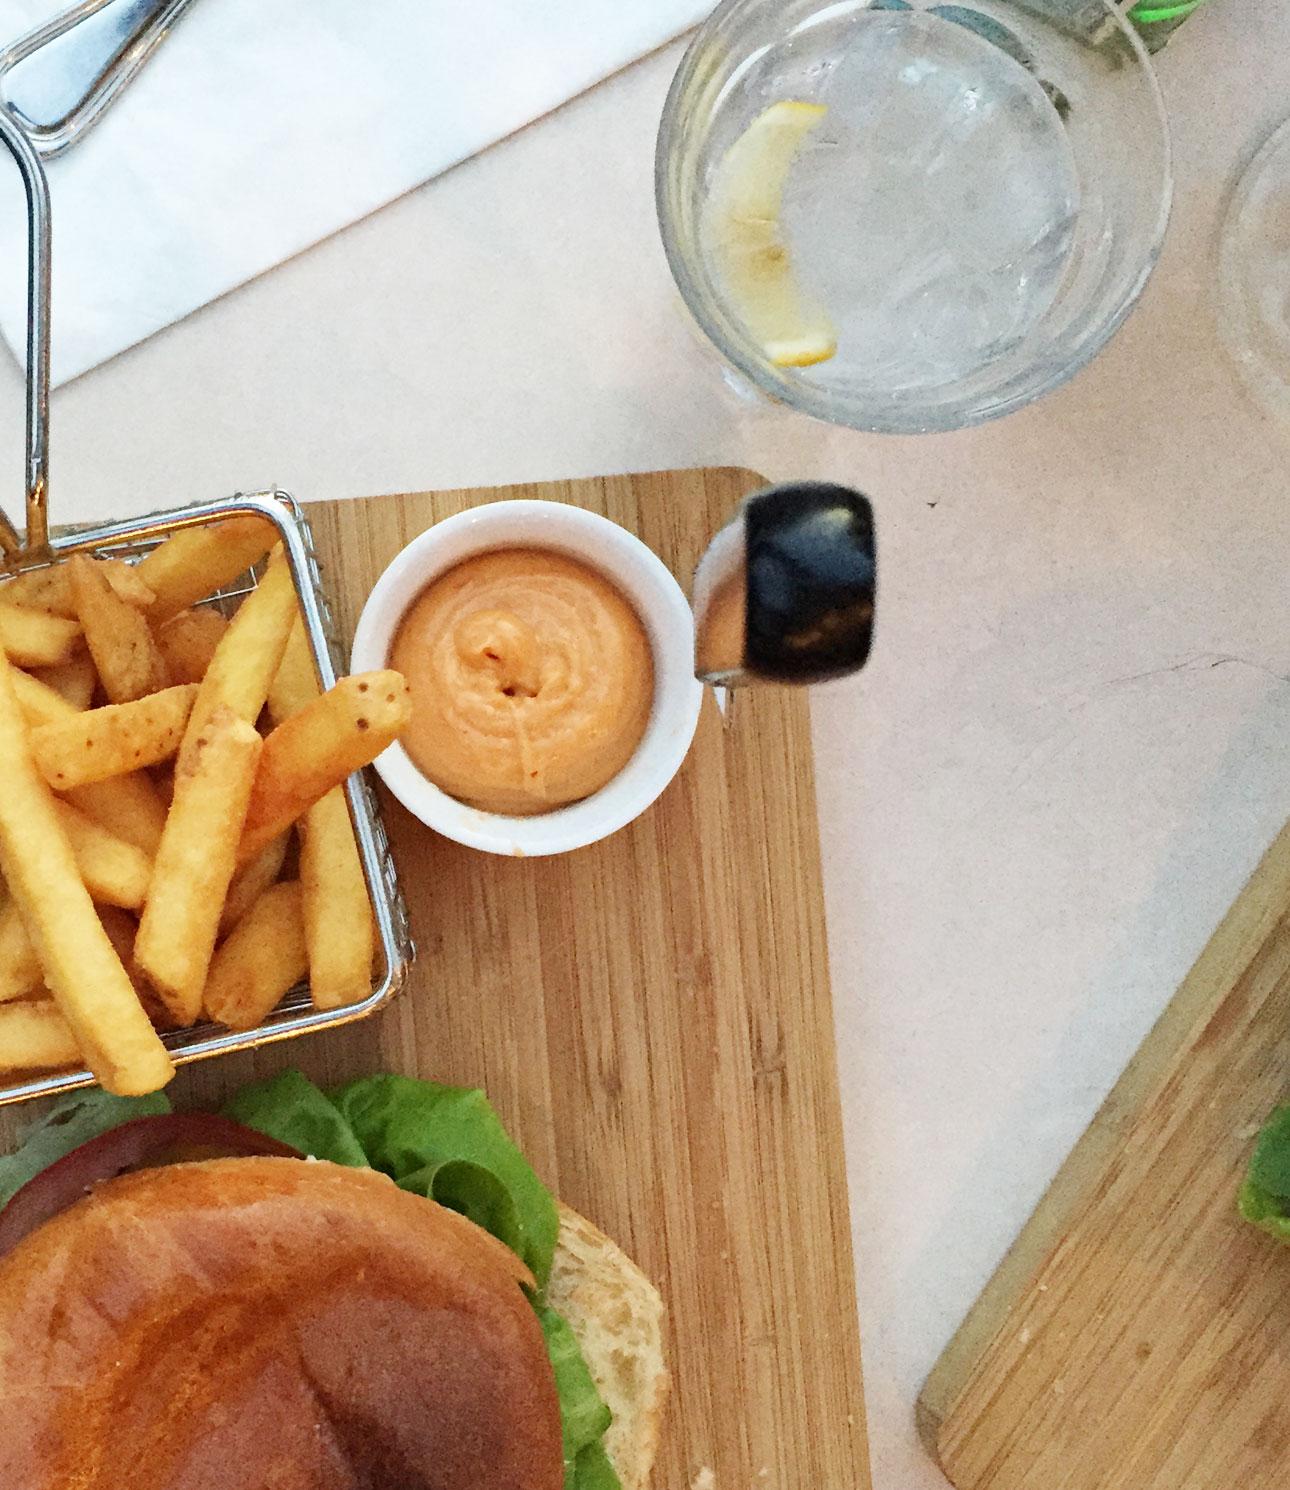 Kopenhagen hotspots cafe alma burger